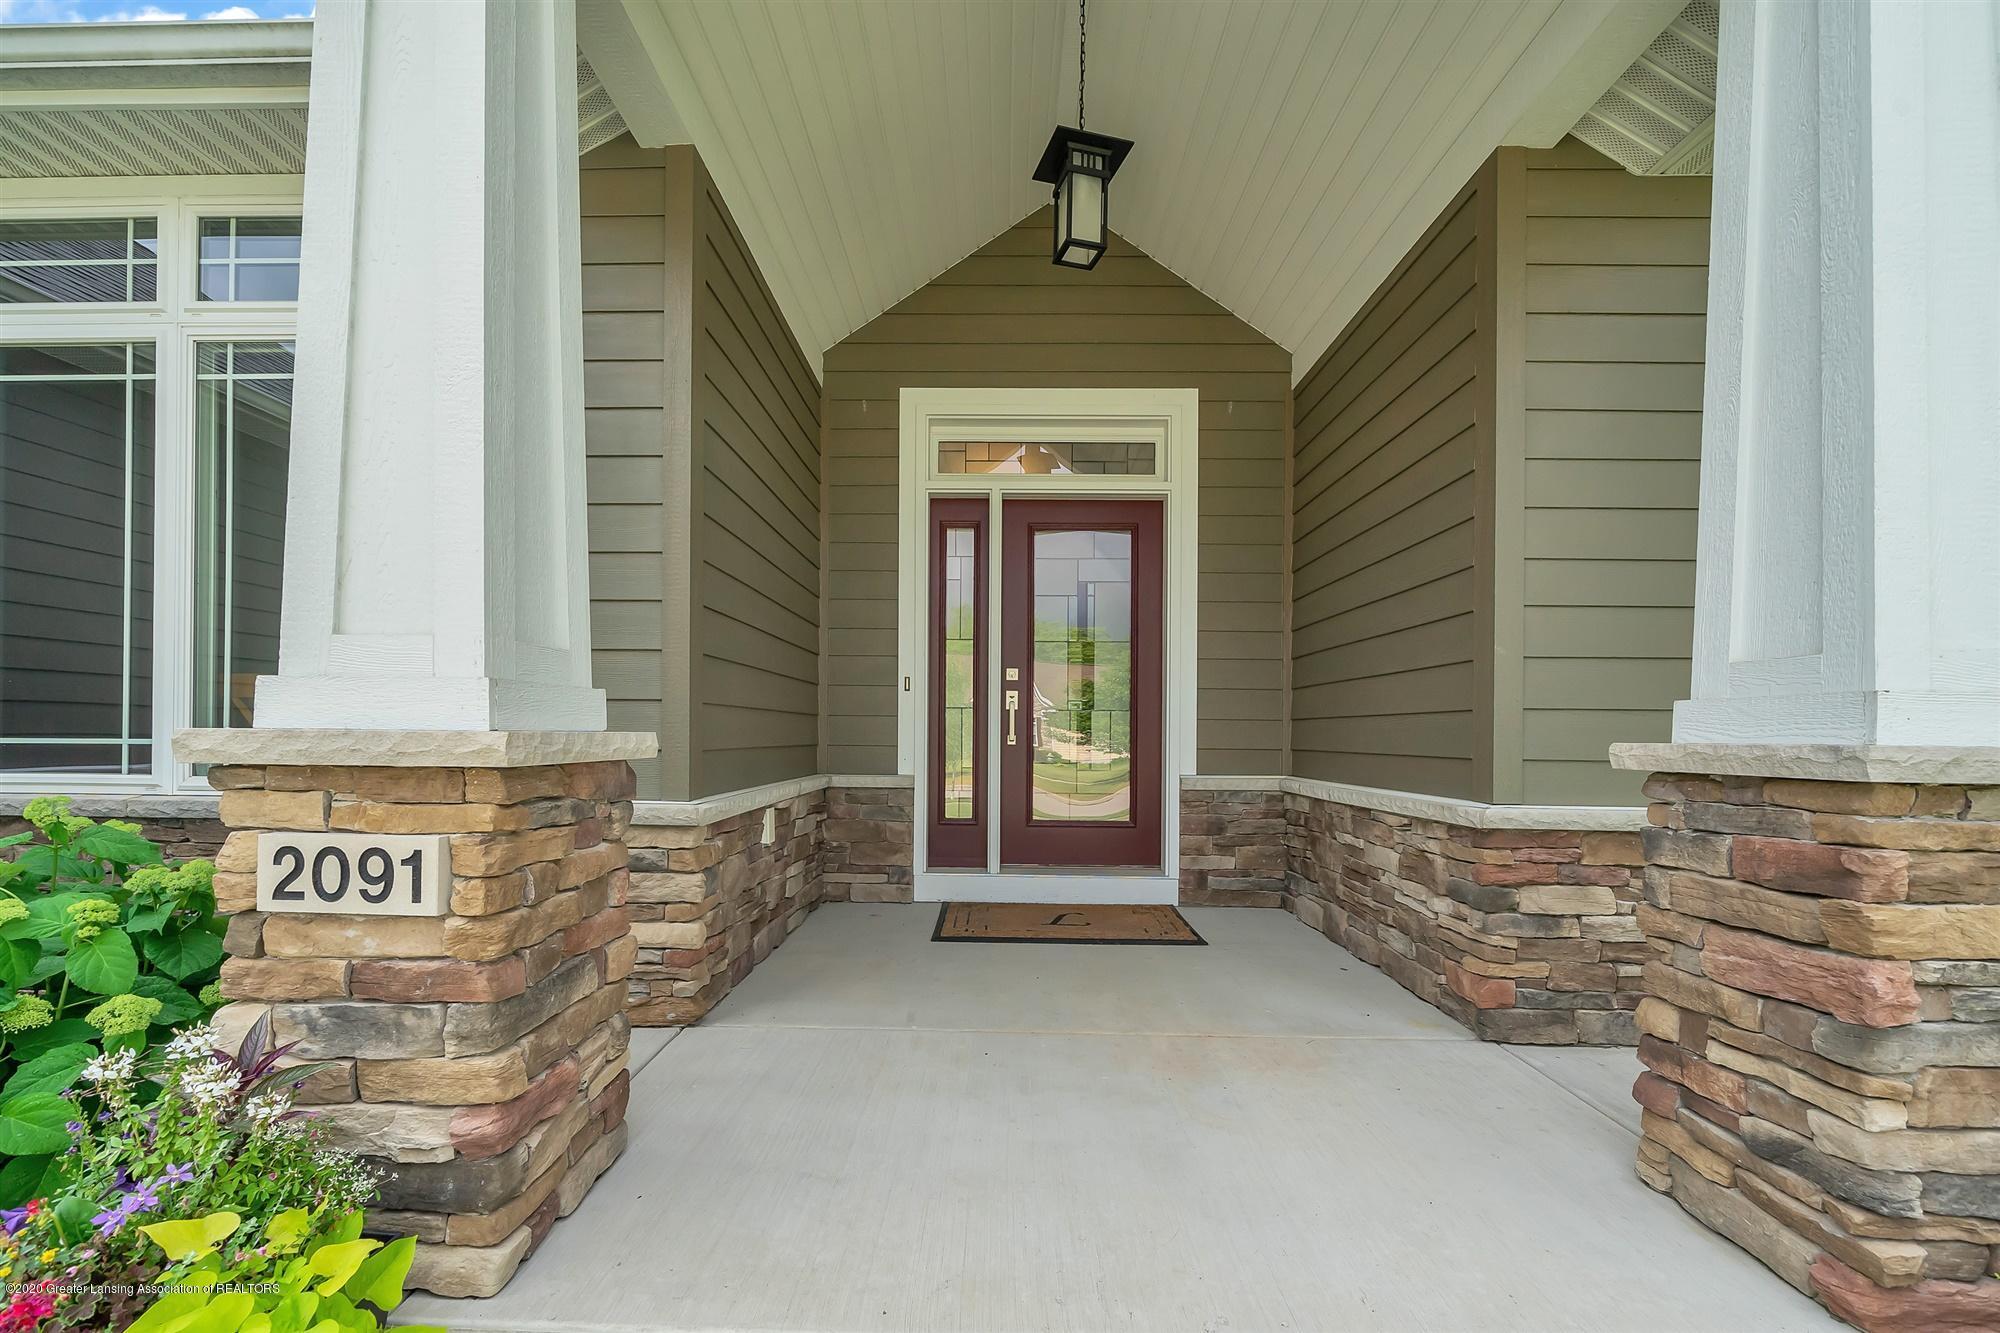 2091 Isaac Ln - EXTERIOR  Porch Porch - 3